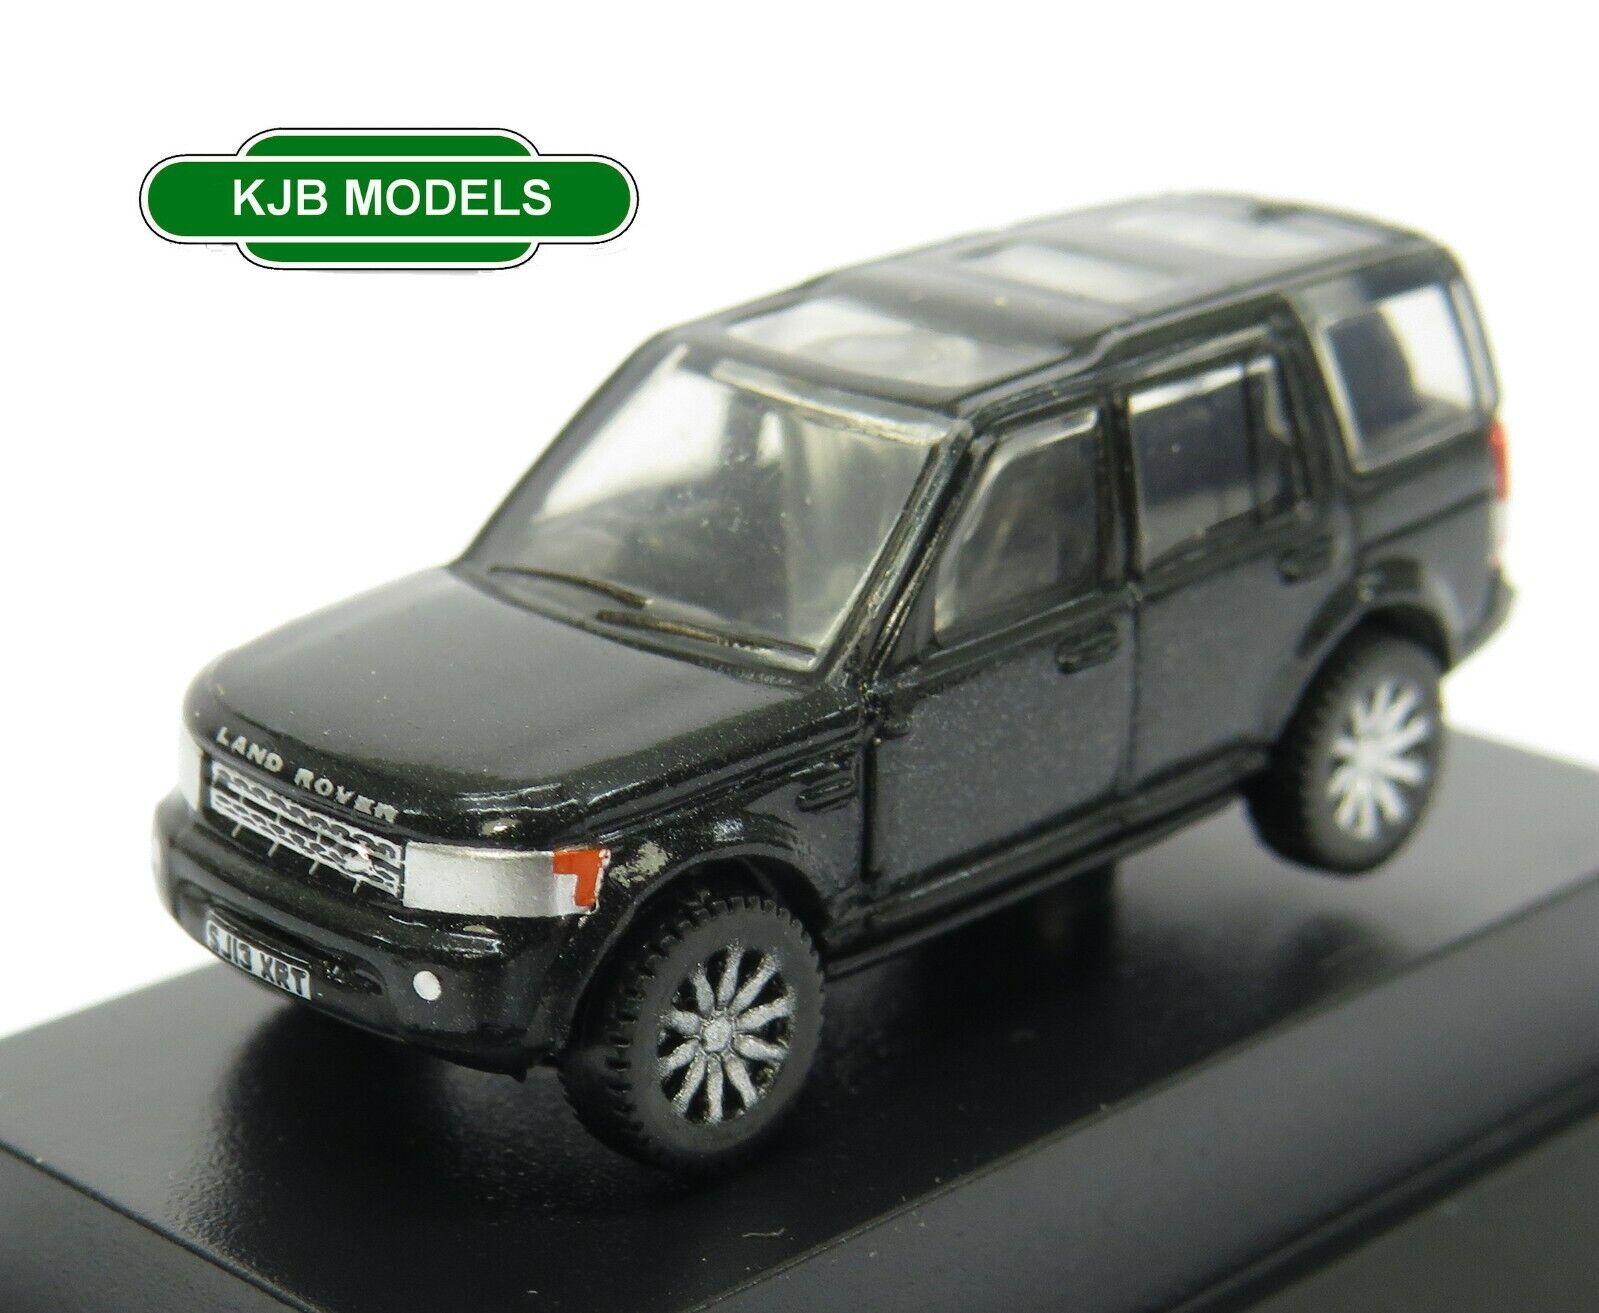 BNIB N GAUGE OXFORD DIECAST 1:148 NDIS002 Land Rover Discovery 4 Santorini Black